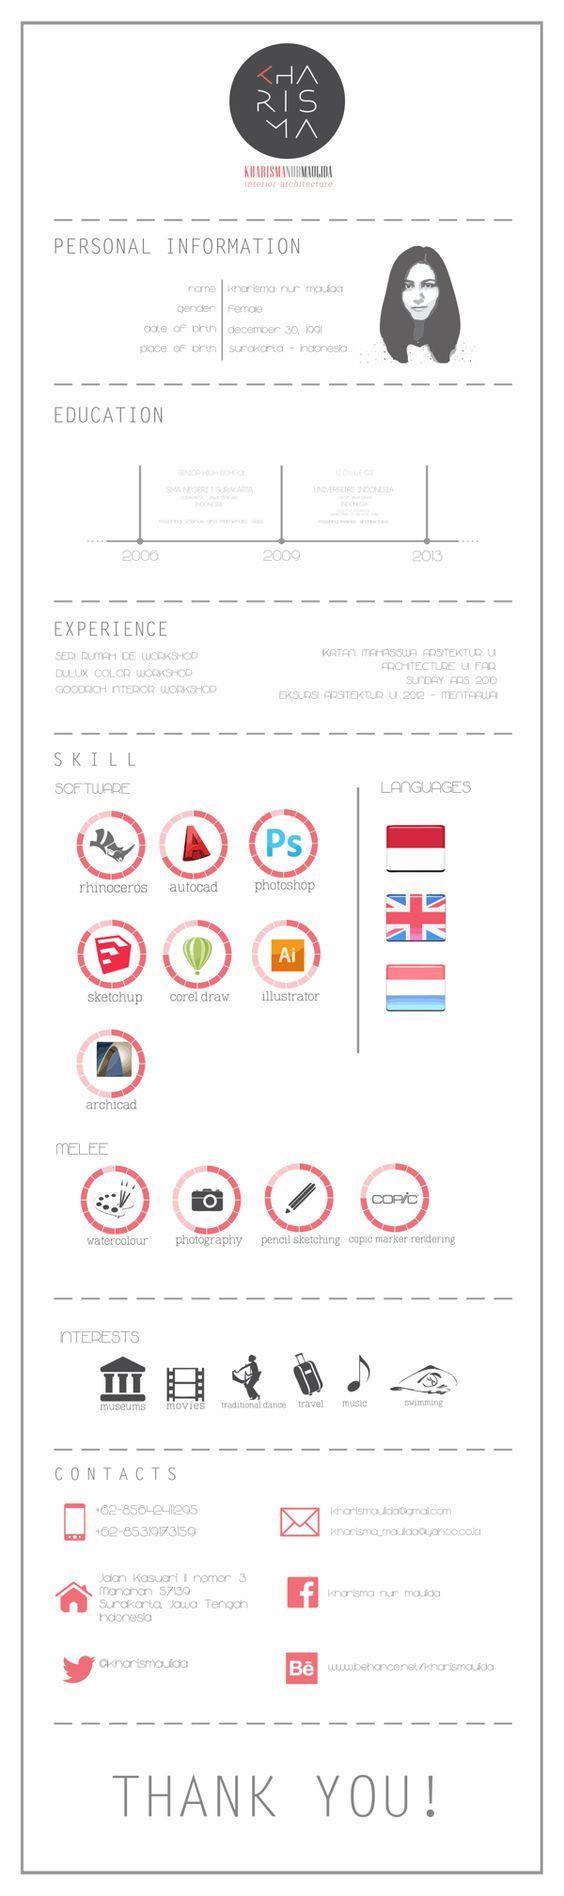 Personal Resume Templates 14 Best Cv  Resumé Images On Pinterest  Resume Design Cv Template .